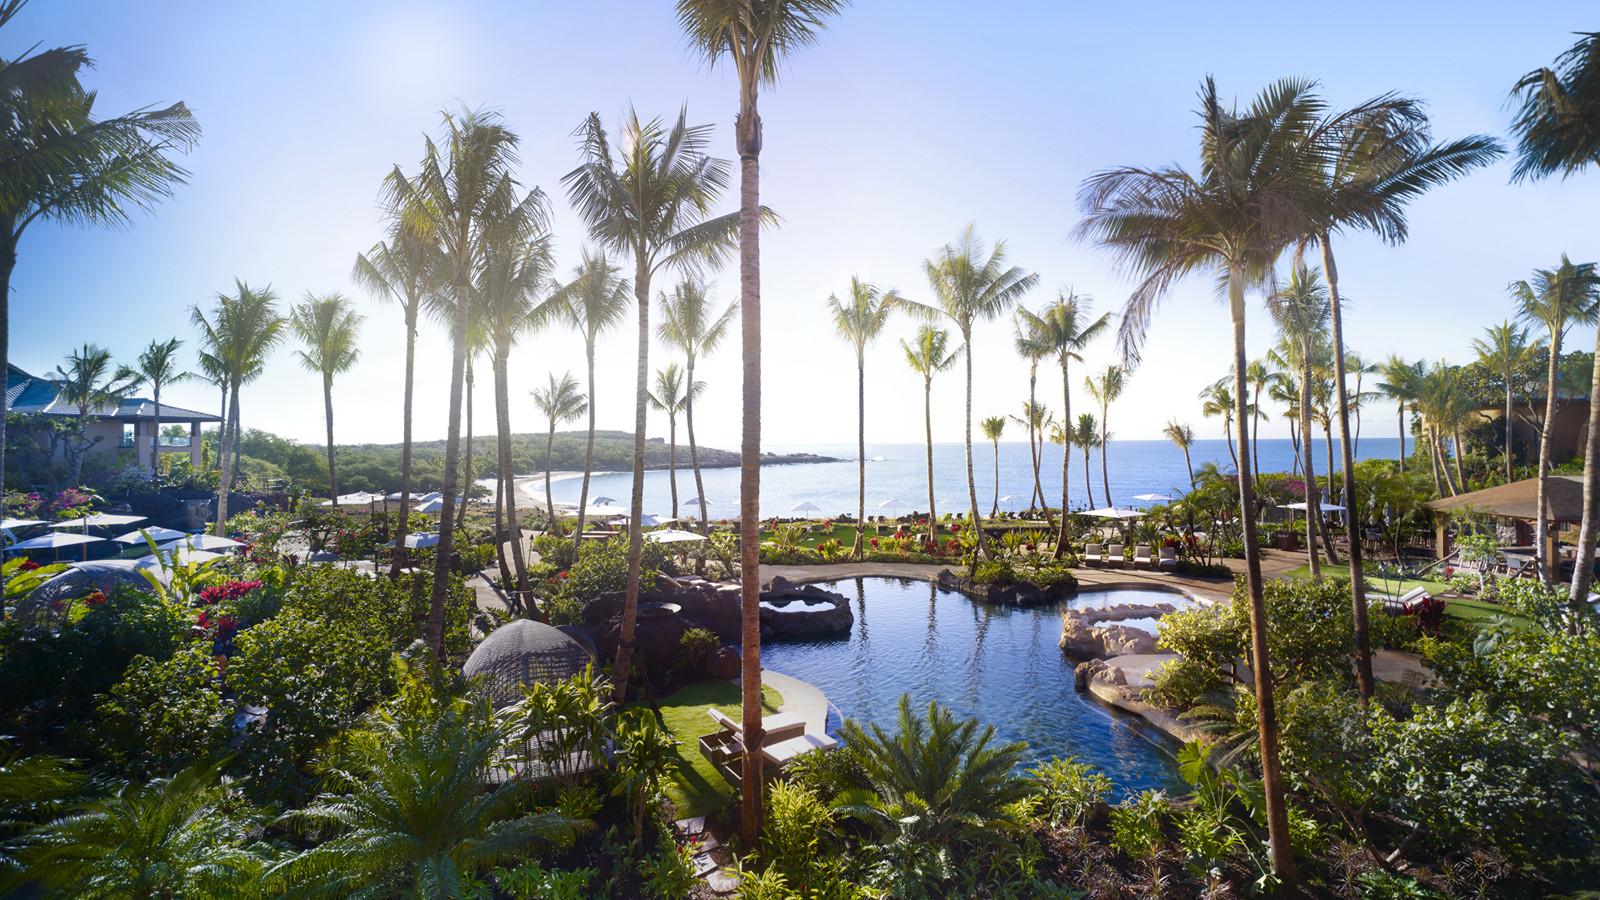 news-main-four-seasons-resort-lanai-named-1-best-hotel-in-the-usa.1612437721.jpg